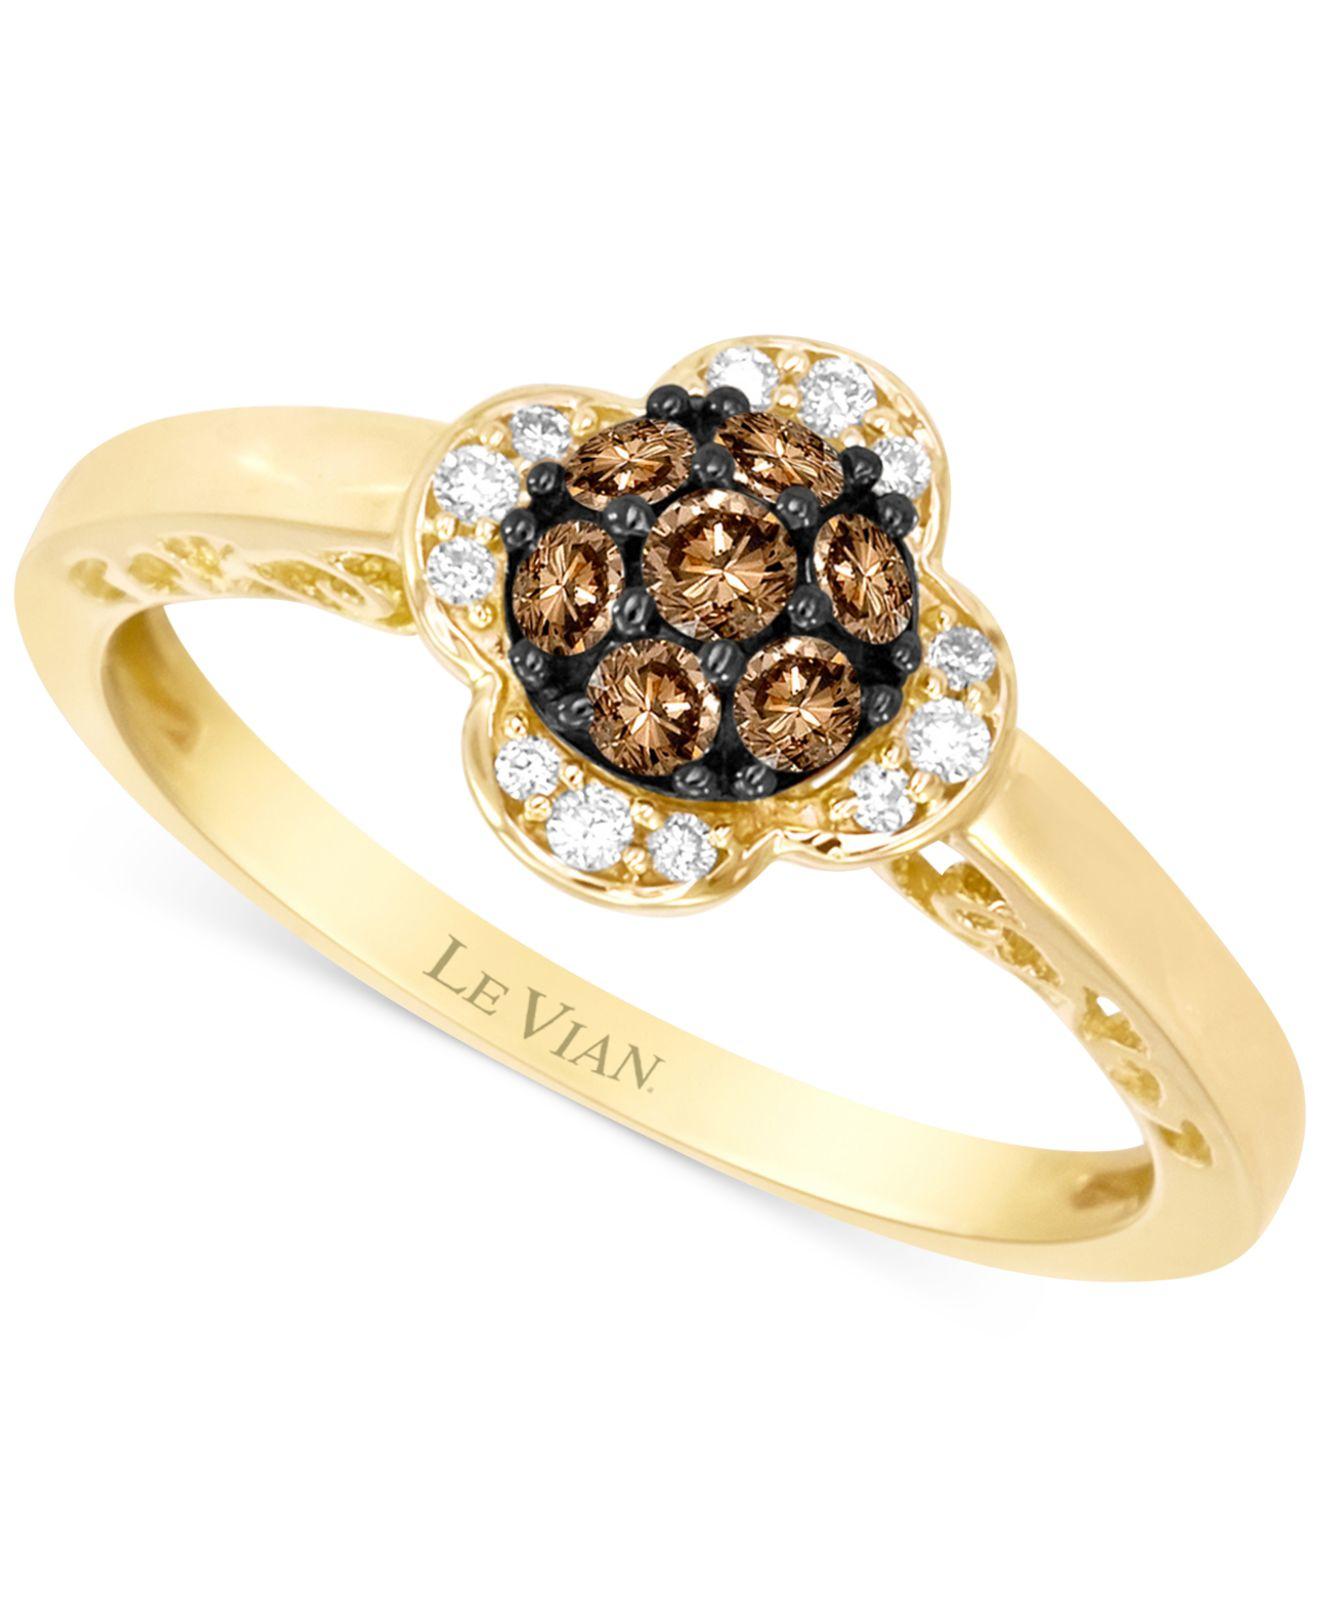 Le Vian Chocolate Diamond Ring Cheap